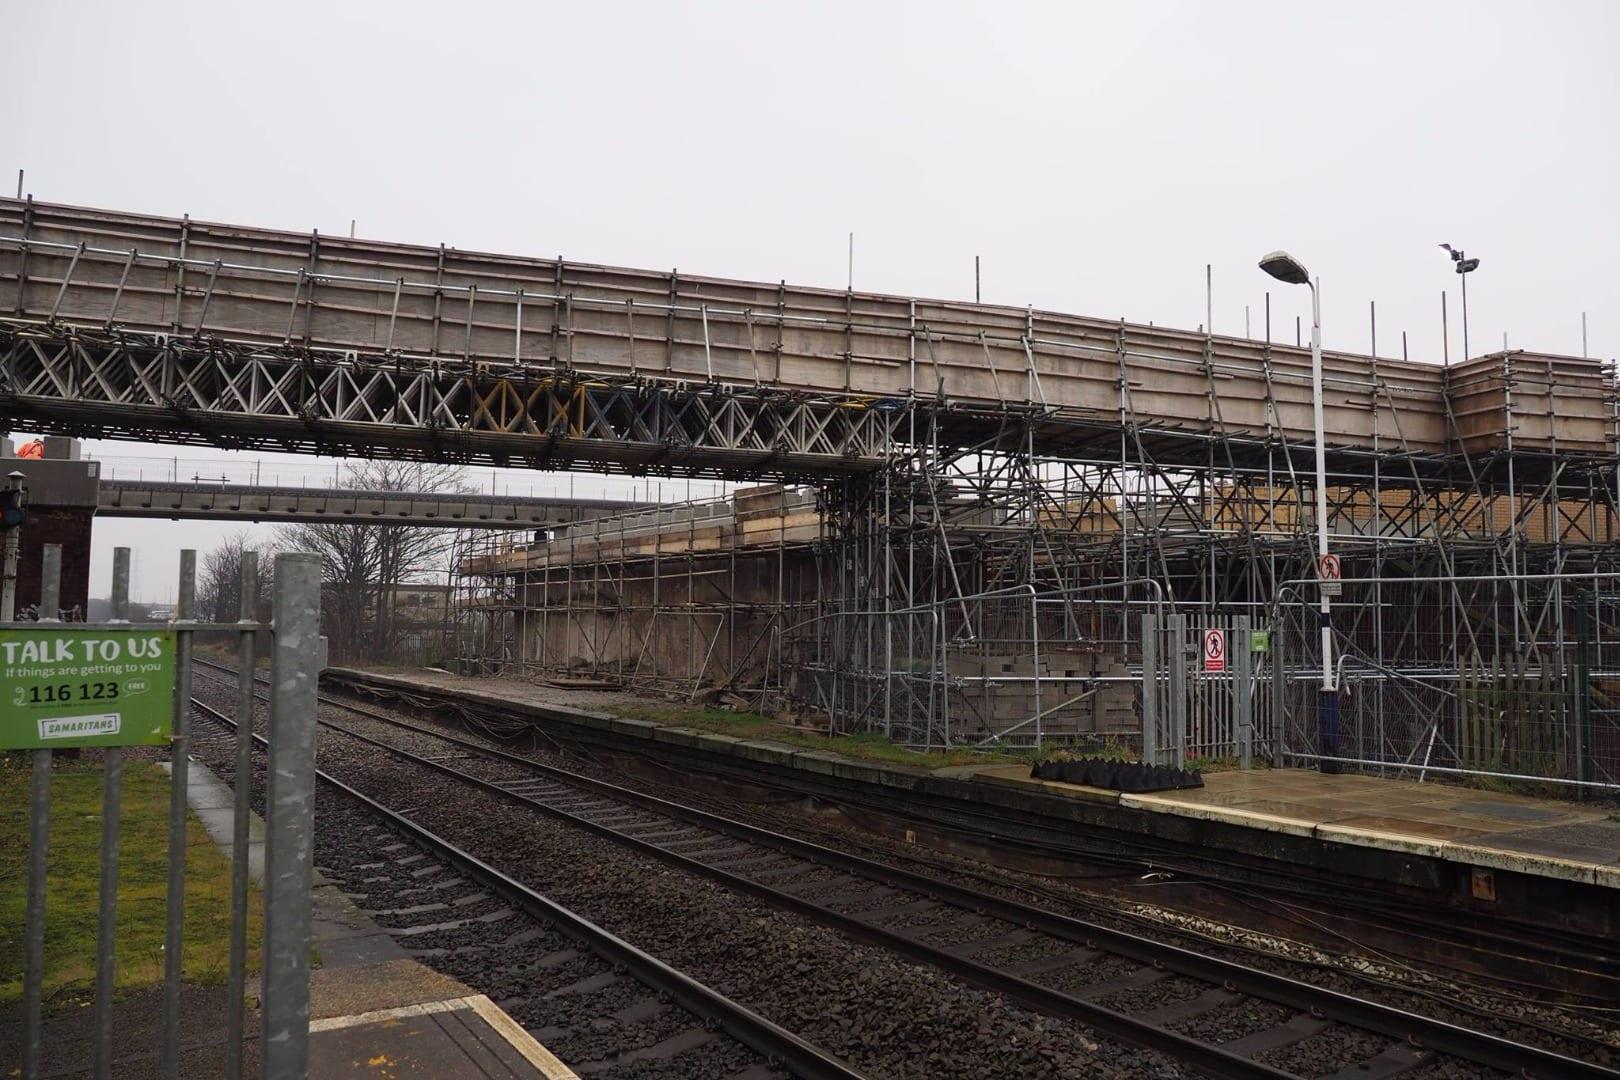 Crossleys bridge, January 2017, photo by Steve Palmer